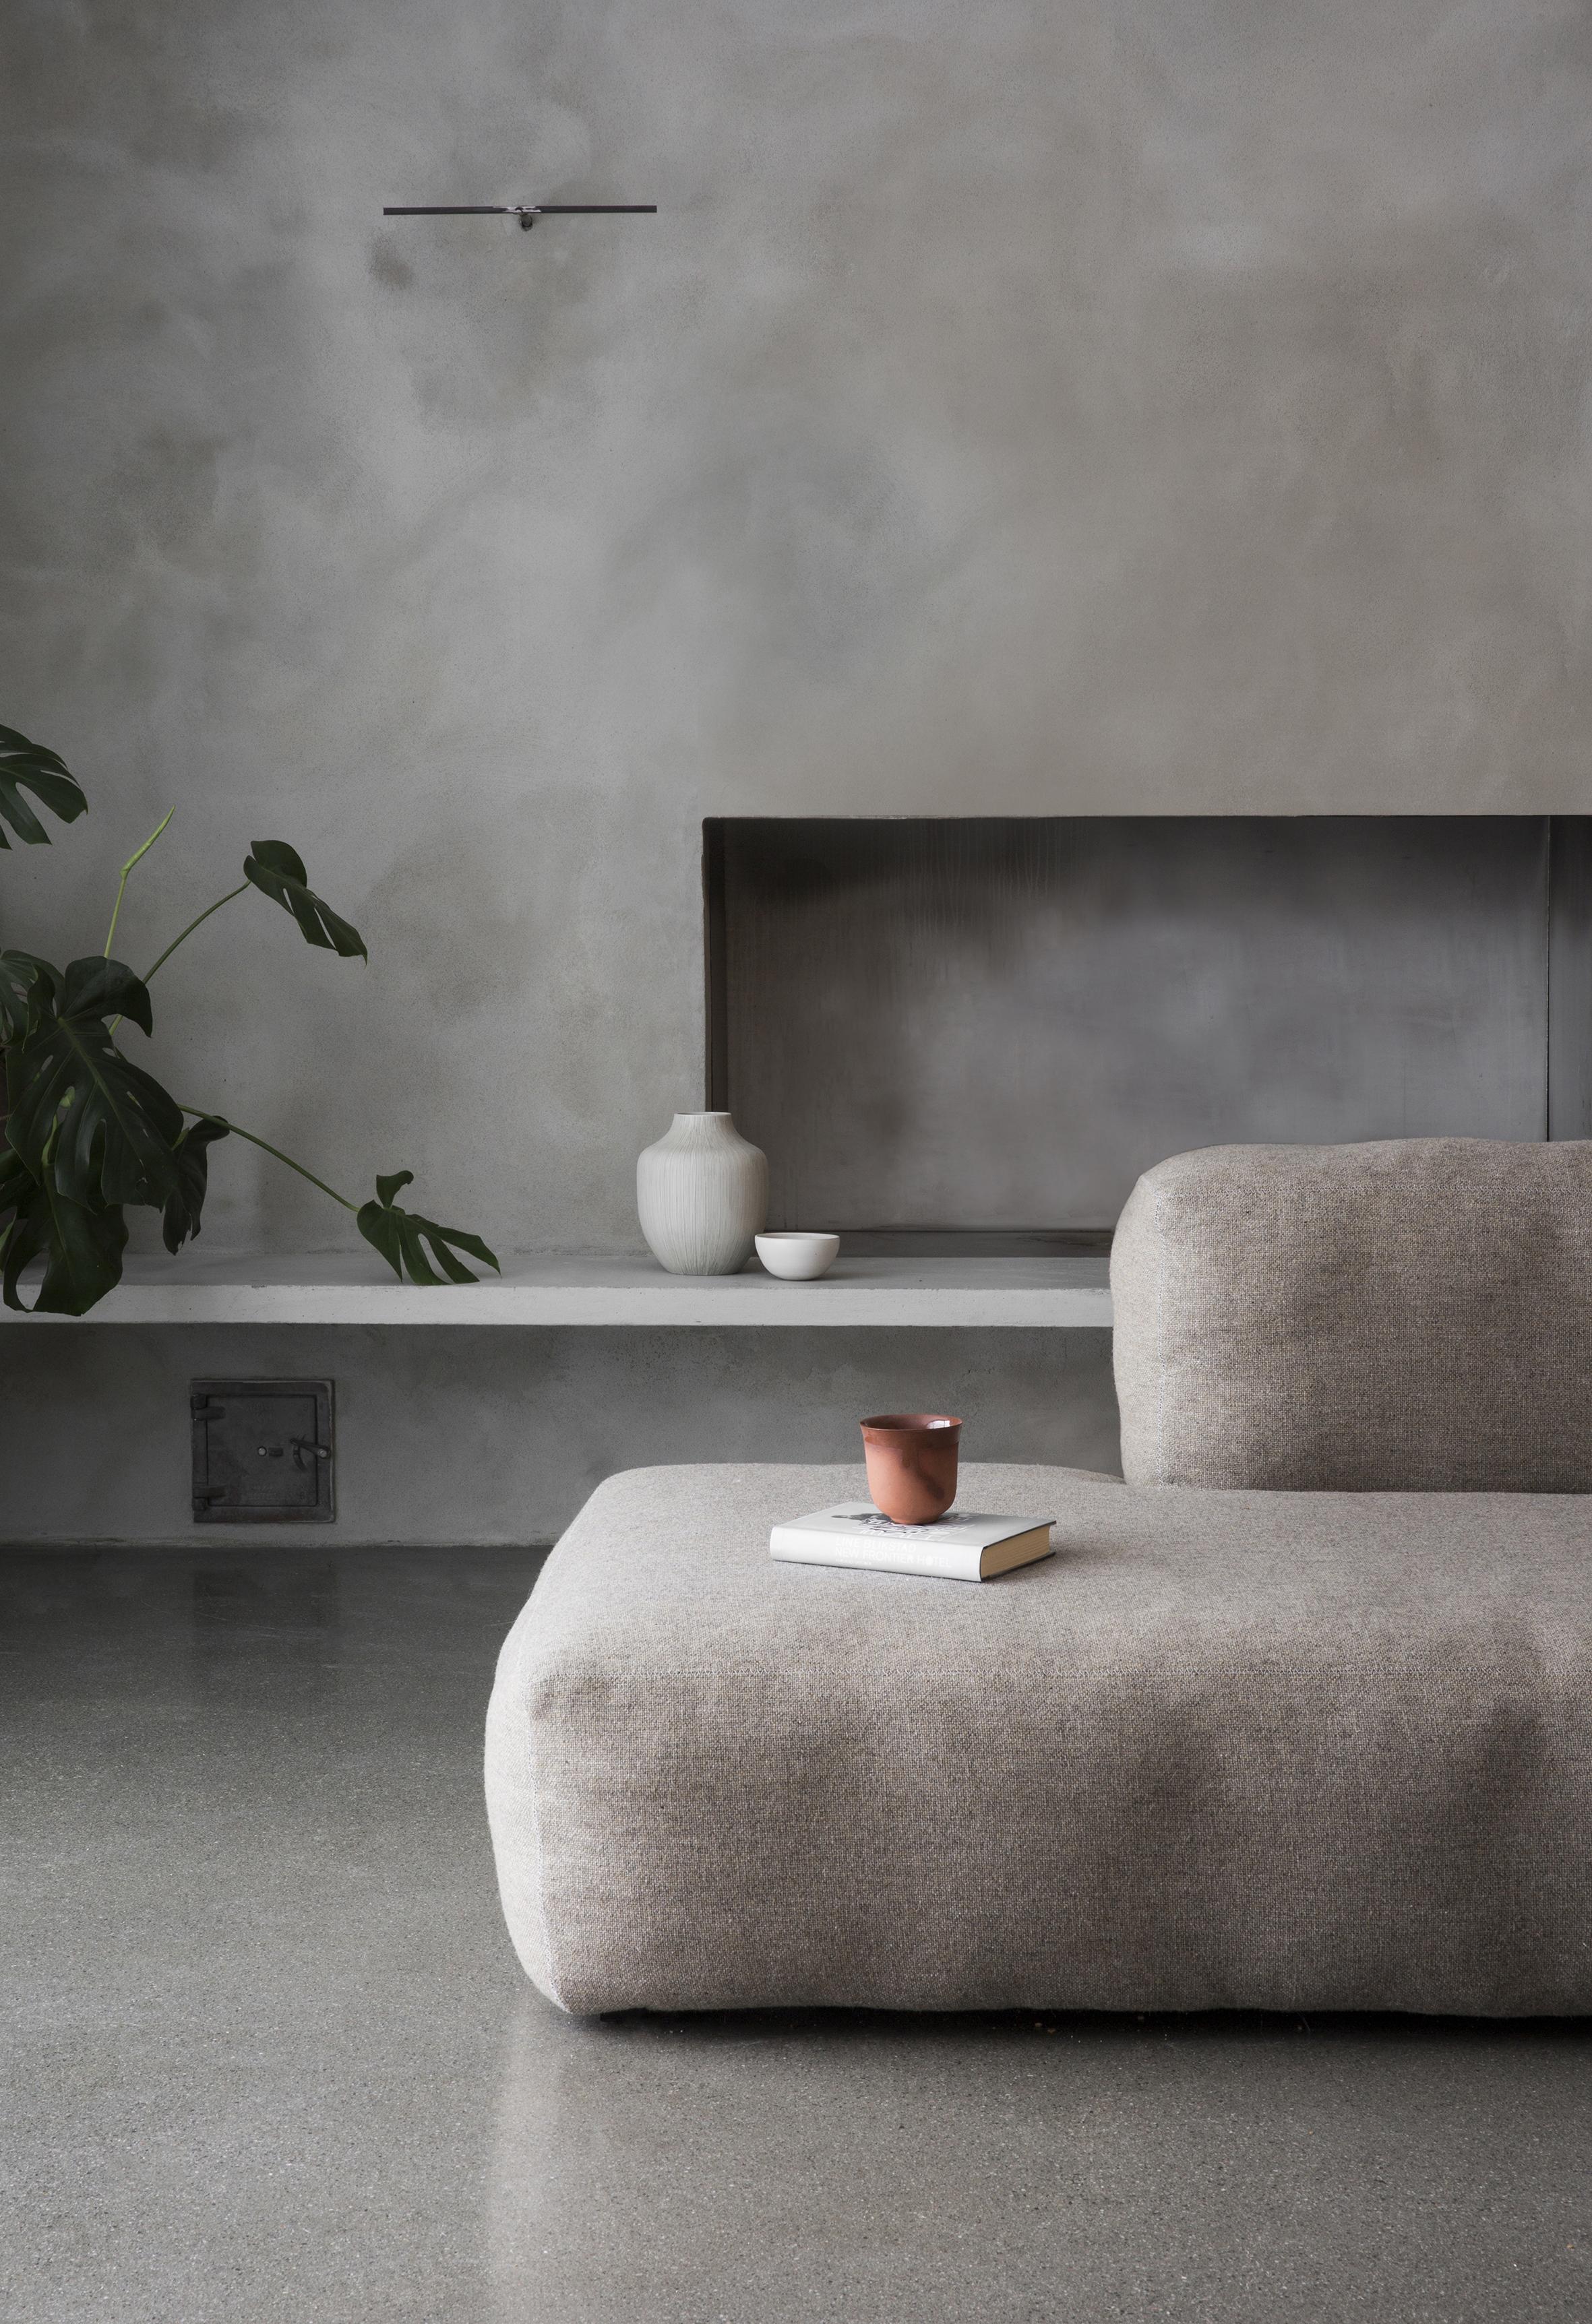 Gjøvik house designed by Norm Architects, Norwegian minimal home